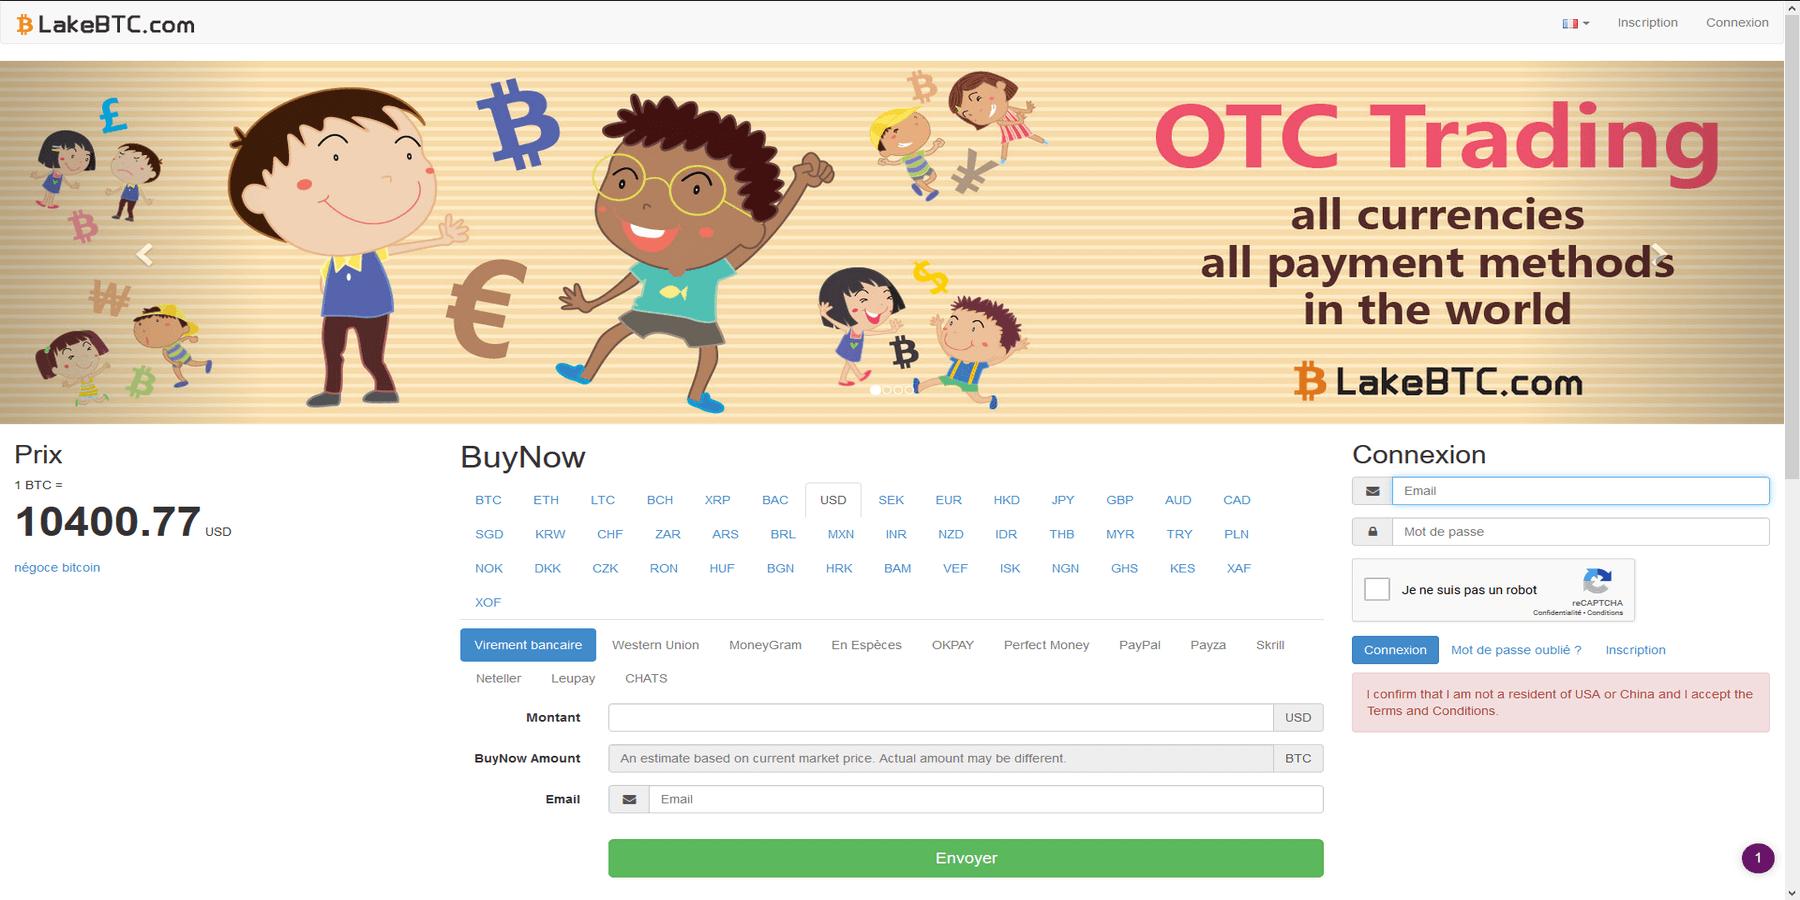 Acheter des cryptomonnaies chez LakeBTC